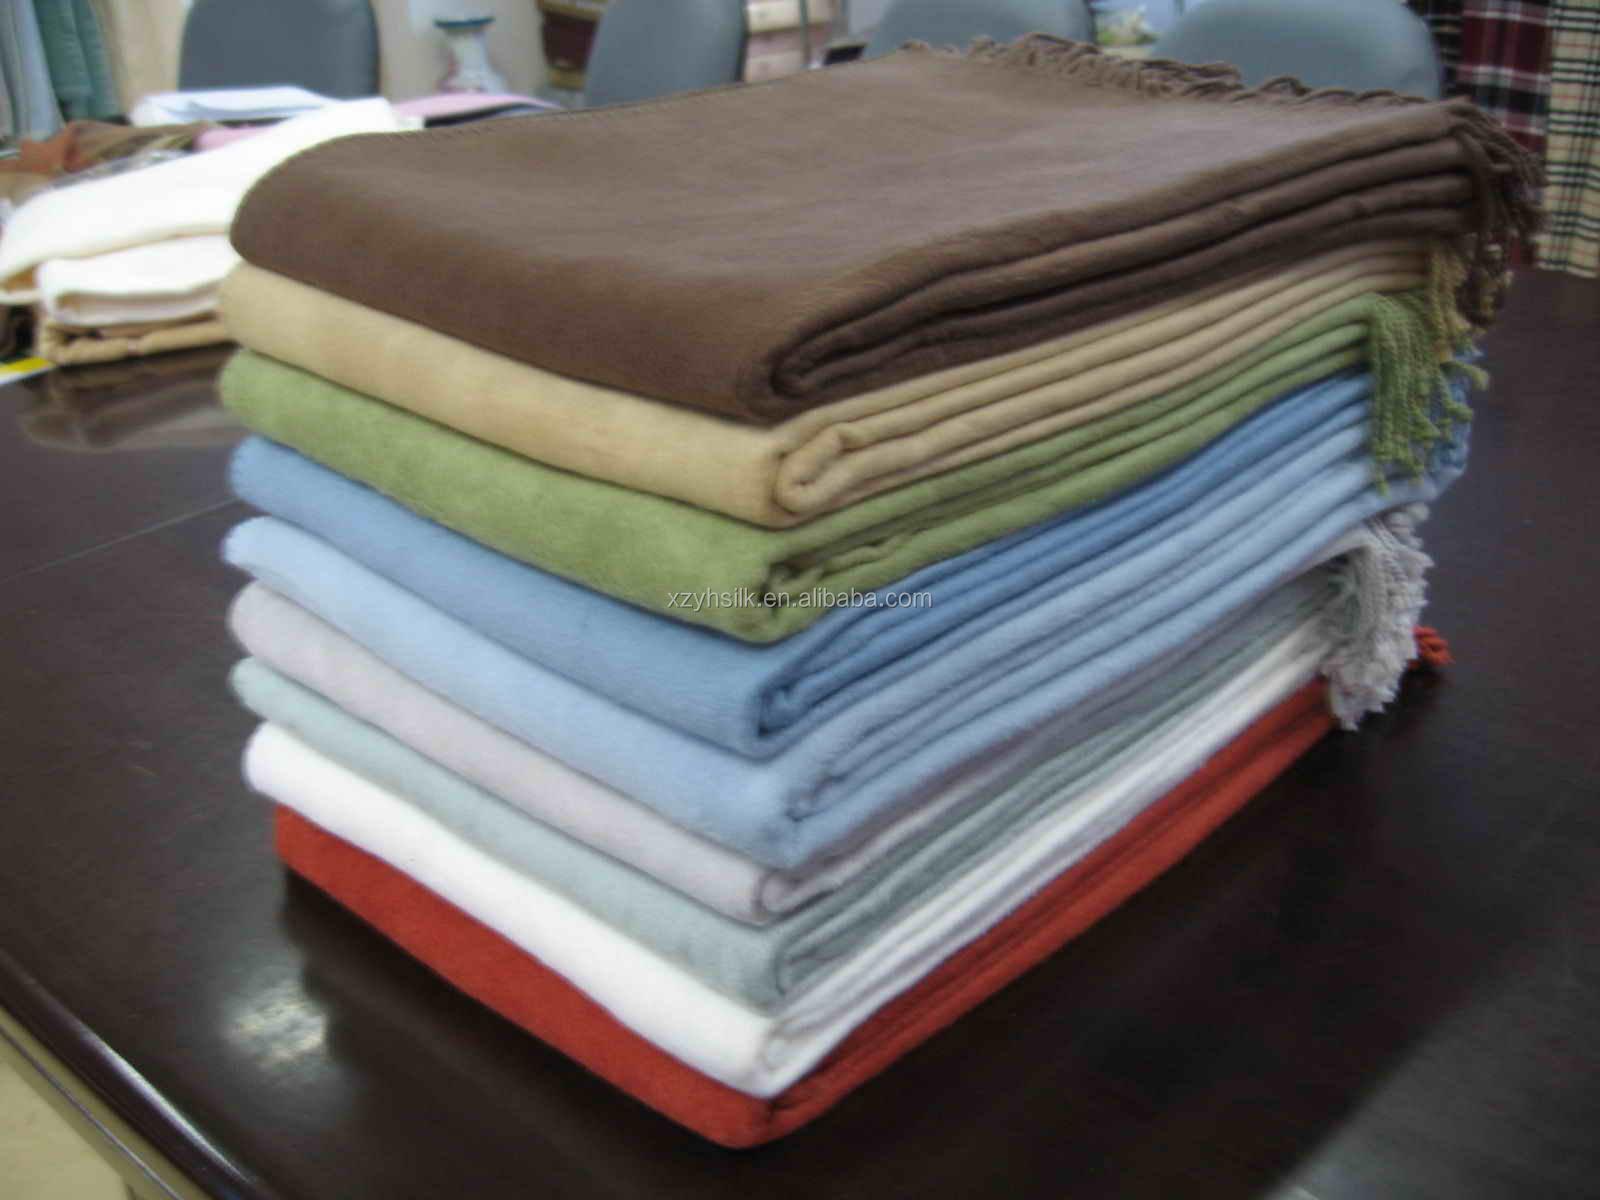 oeko certificate 100 natural bamboo blanket sofa throws buy blanket sofa throws bamboo cotton. Black Bedroom Furniture Sets. Home Design Ideas